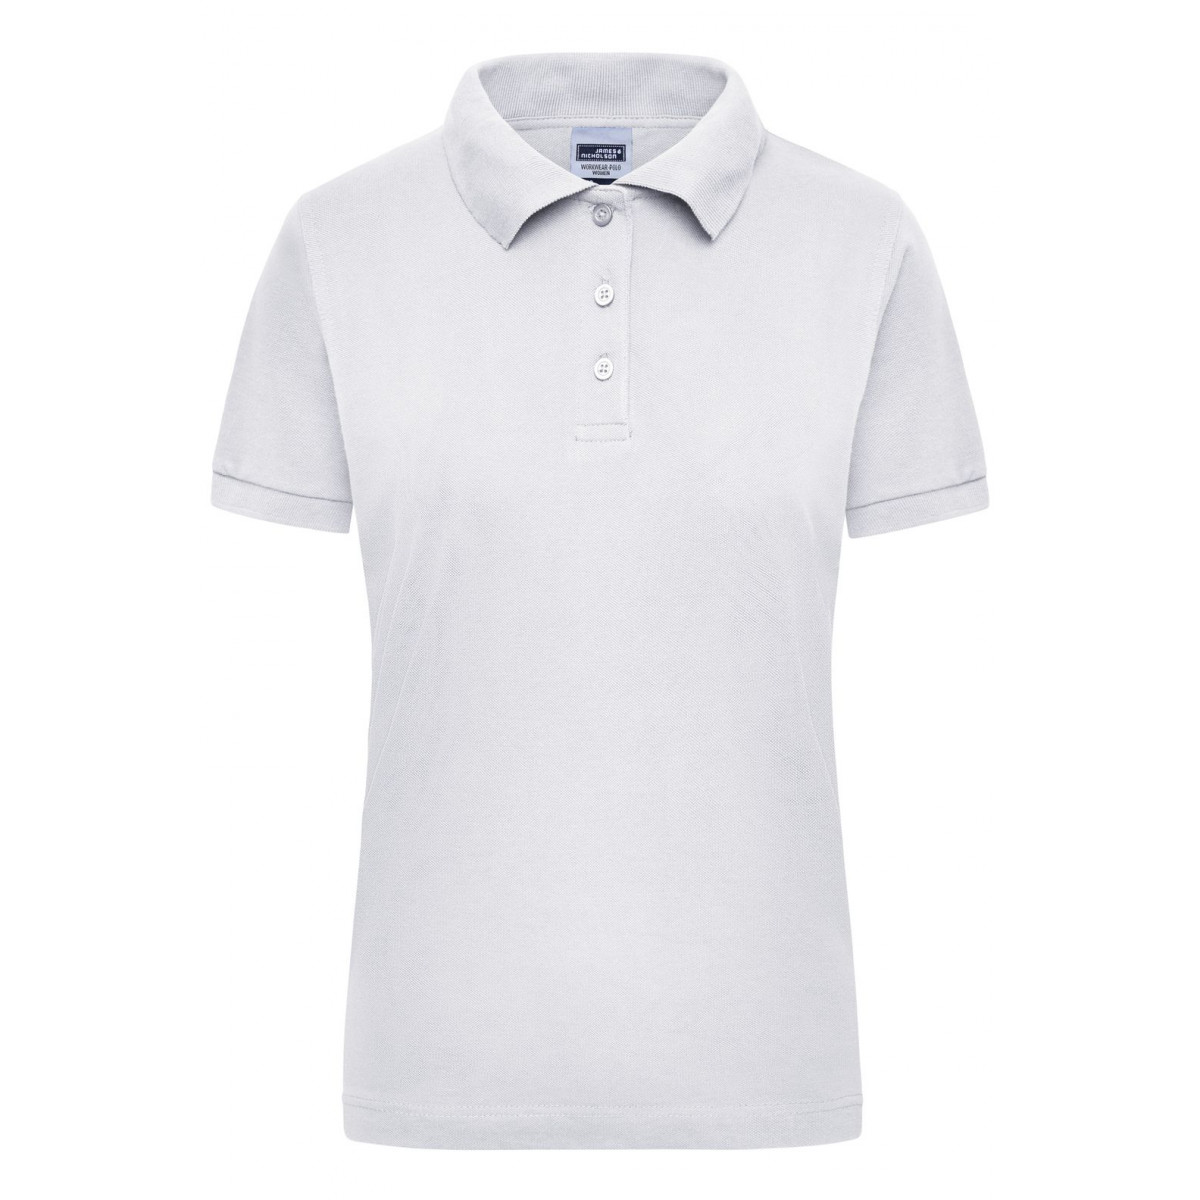 Рубашка поло мужская JN803 Workwear Polo Women - Белый